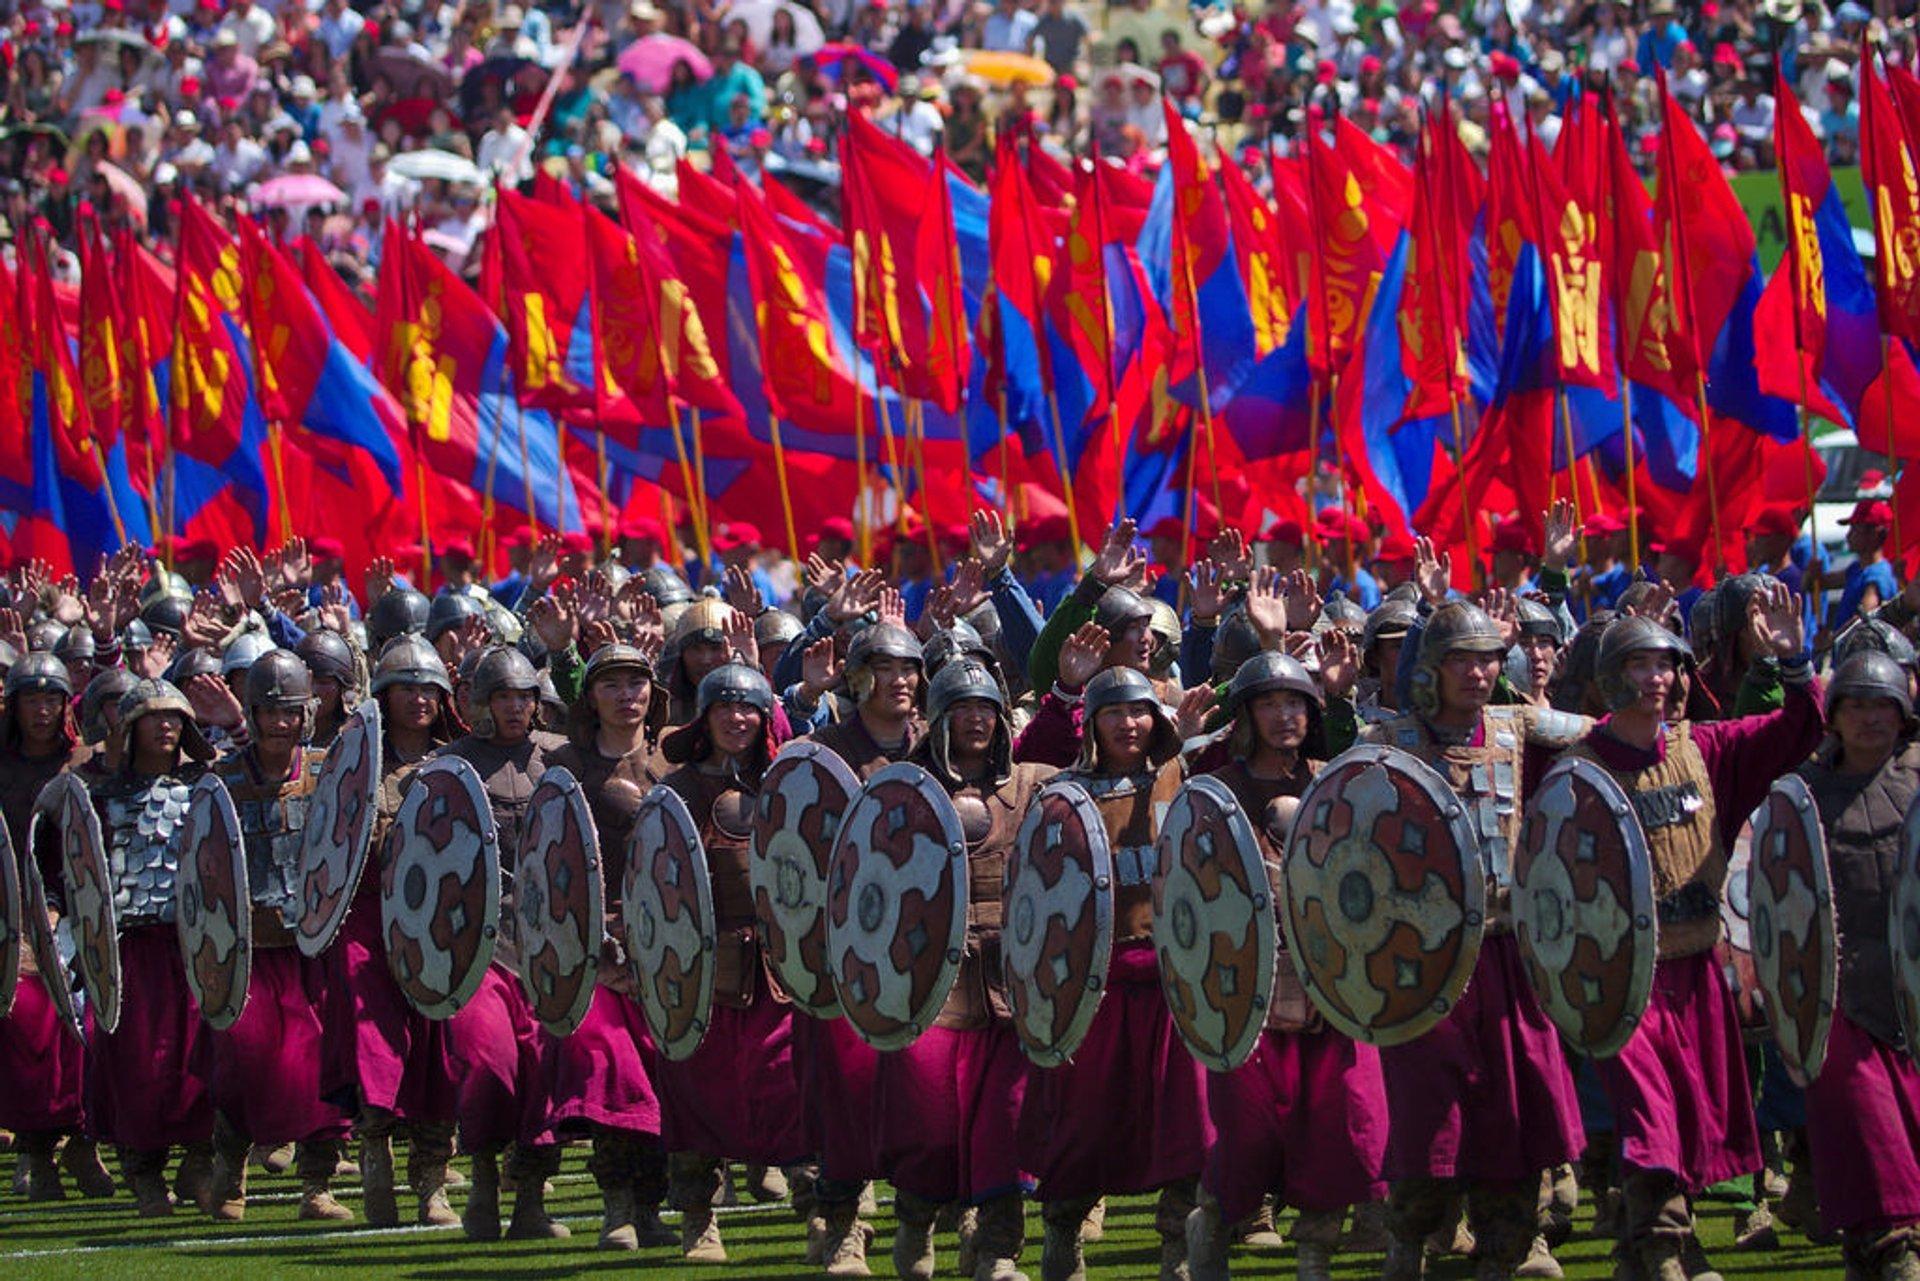 Naadam Festival in Mongolia 2019 - Best Time